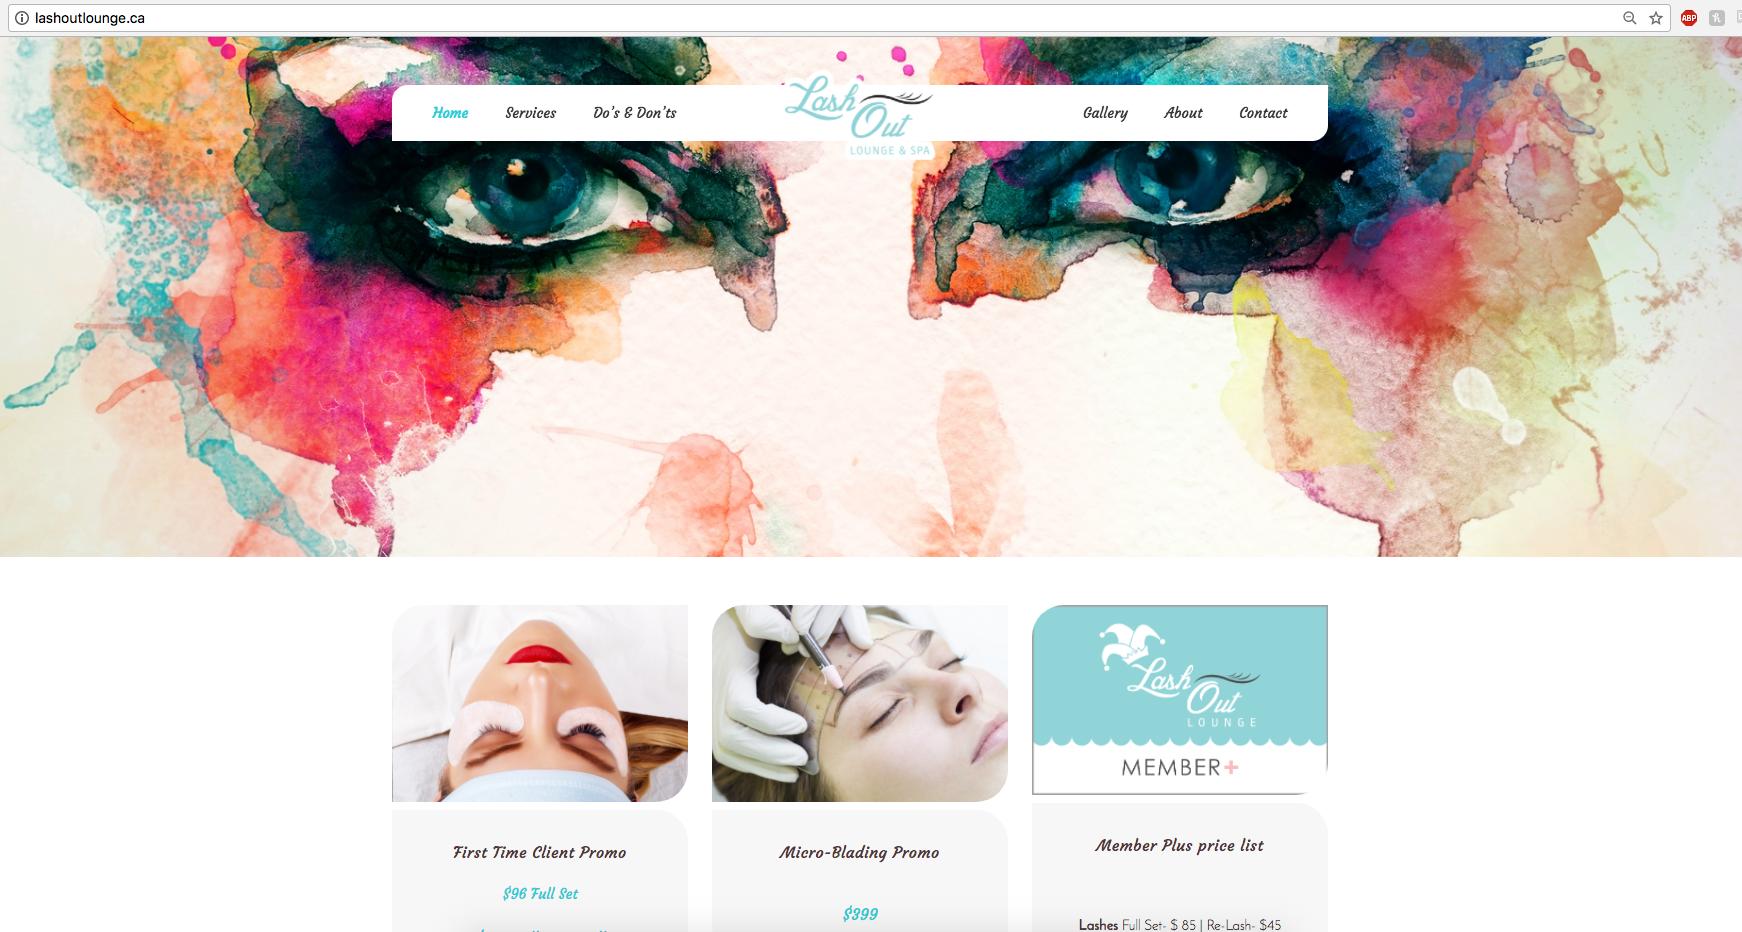 Lash Out Lounge & Spa Website